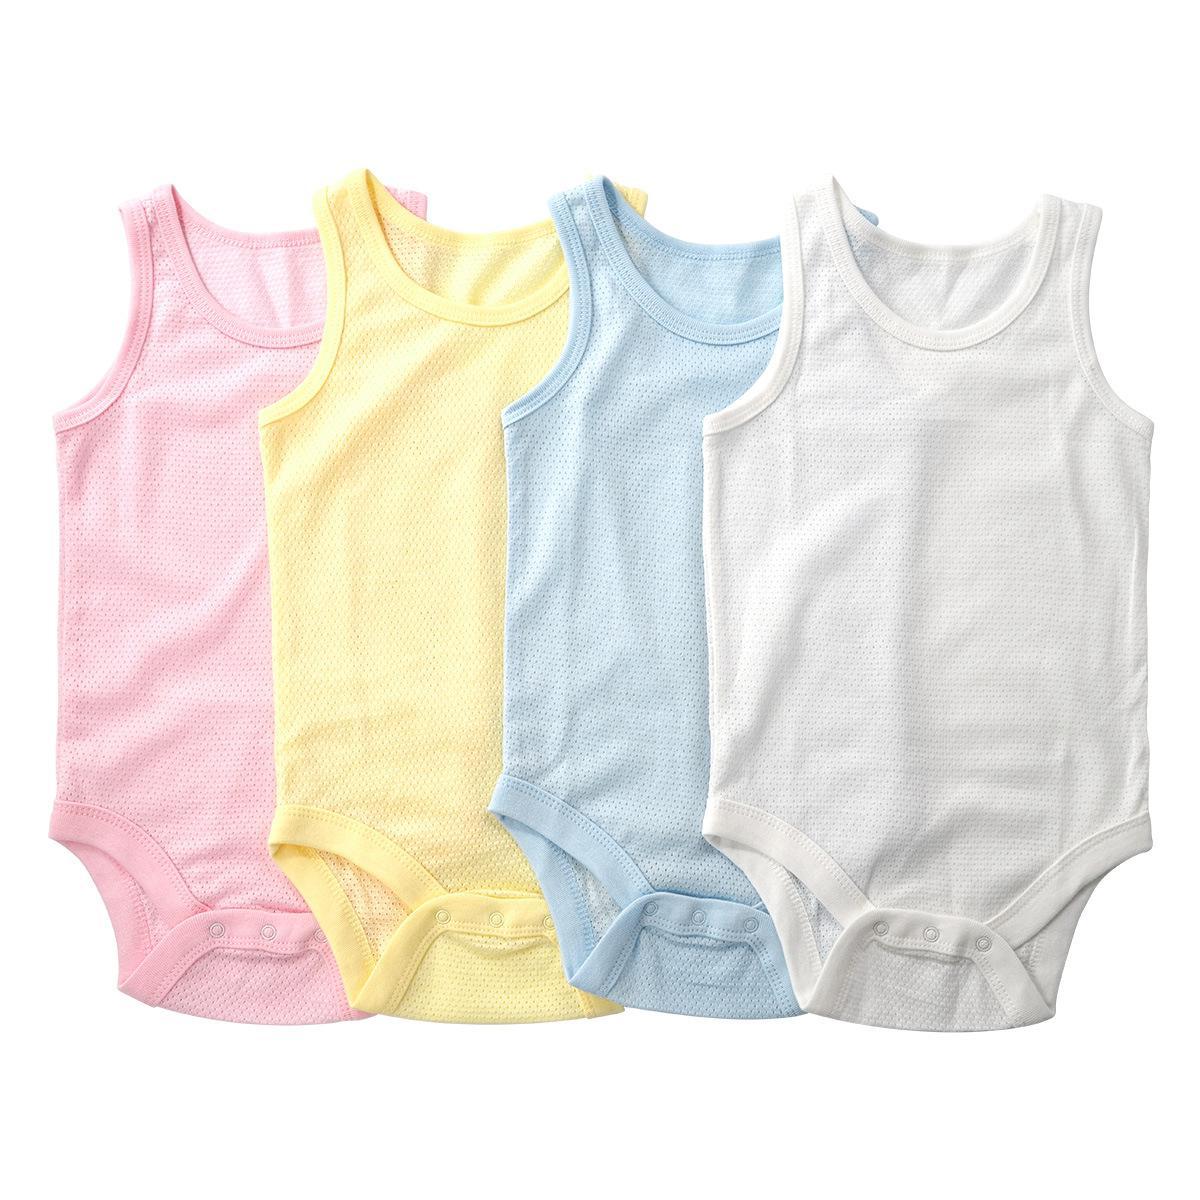 Newborn Baby Boys Girls Summer Thin Bodysuit Cute Baby Wear Vest Sports Breathable Cotton Mesh Clothes Infant Jumpsuit Pajamas